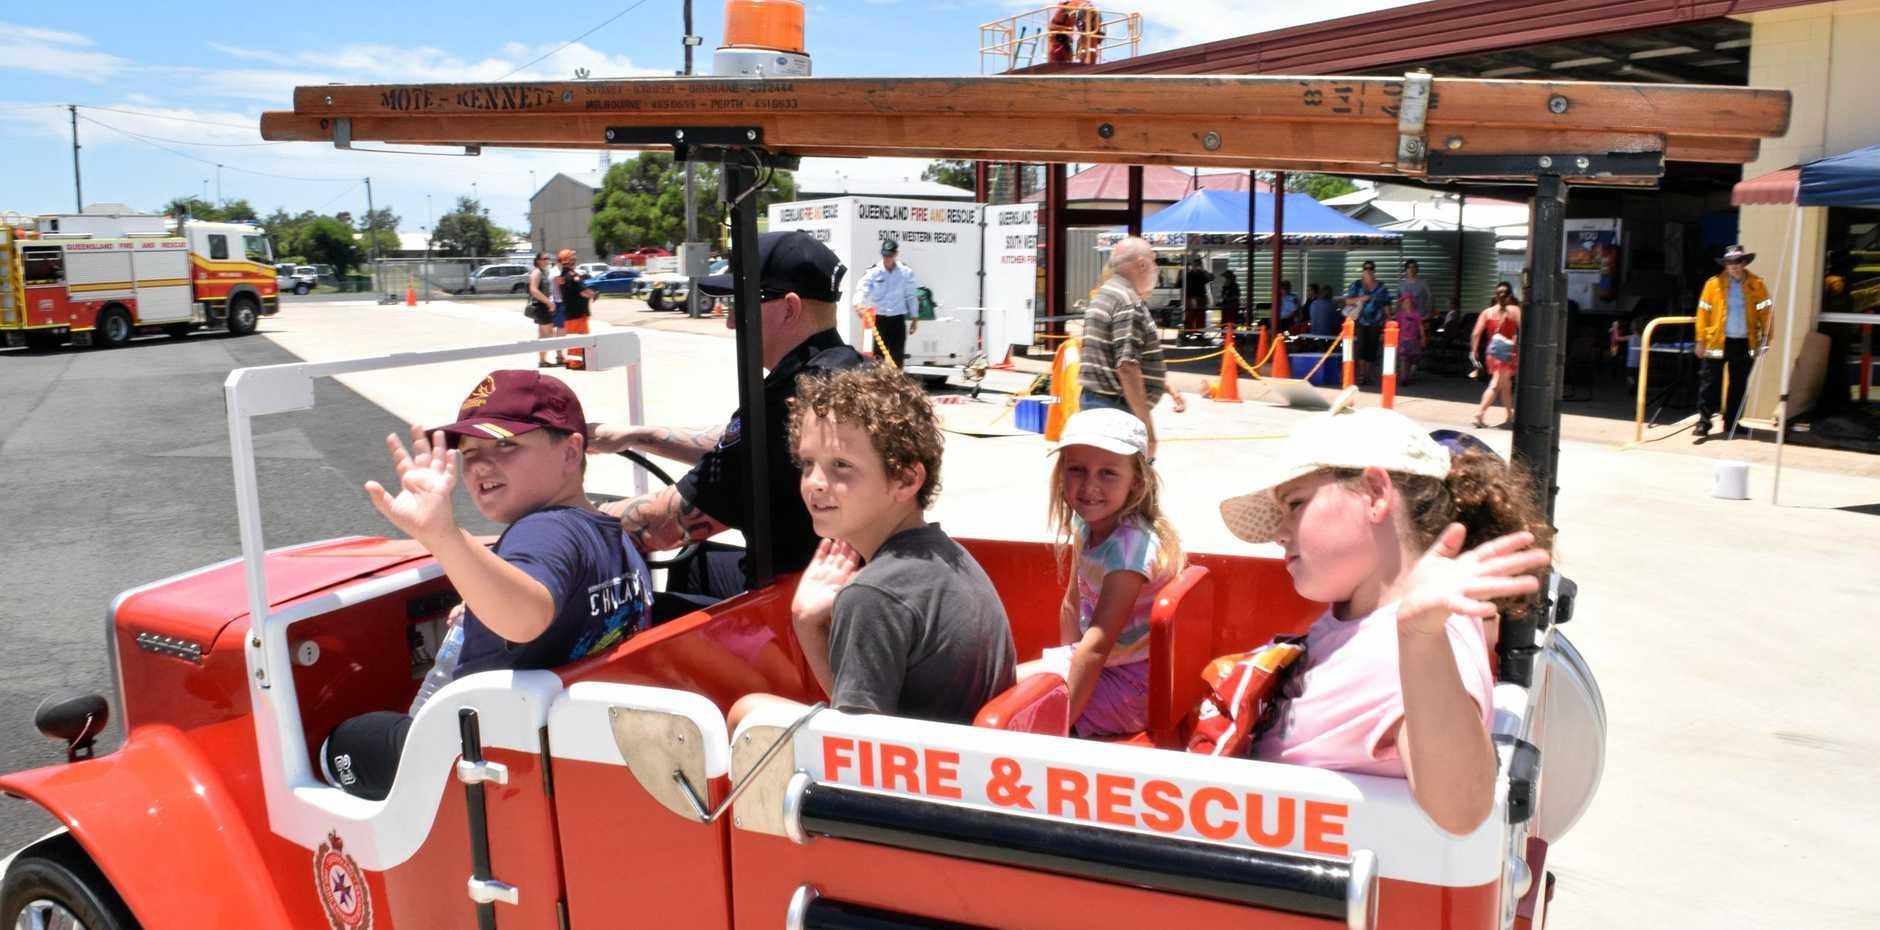 The kids get a ride in Little Squirt, driven by firefighter Dean Murphy.